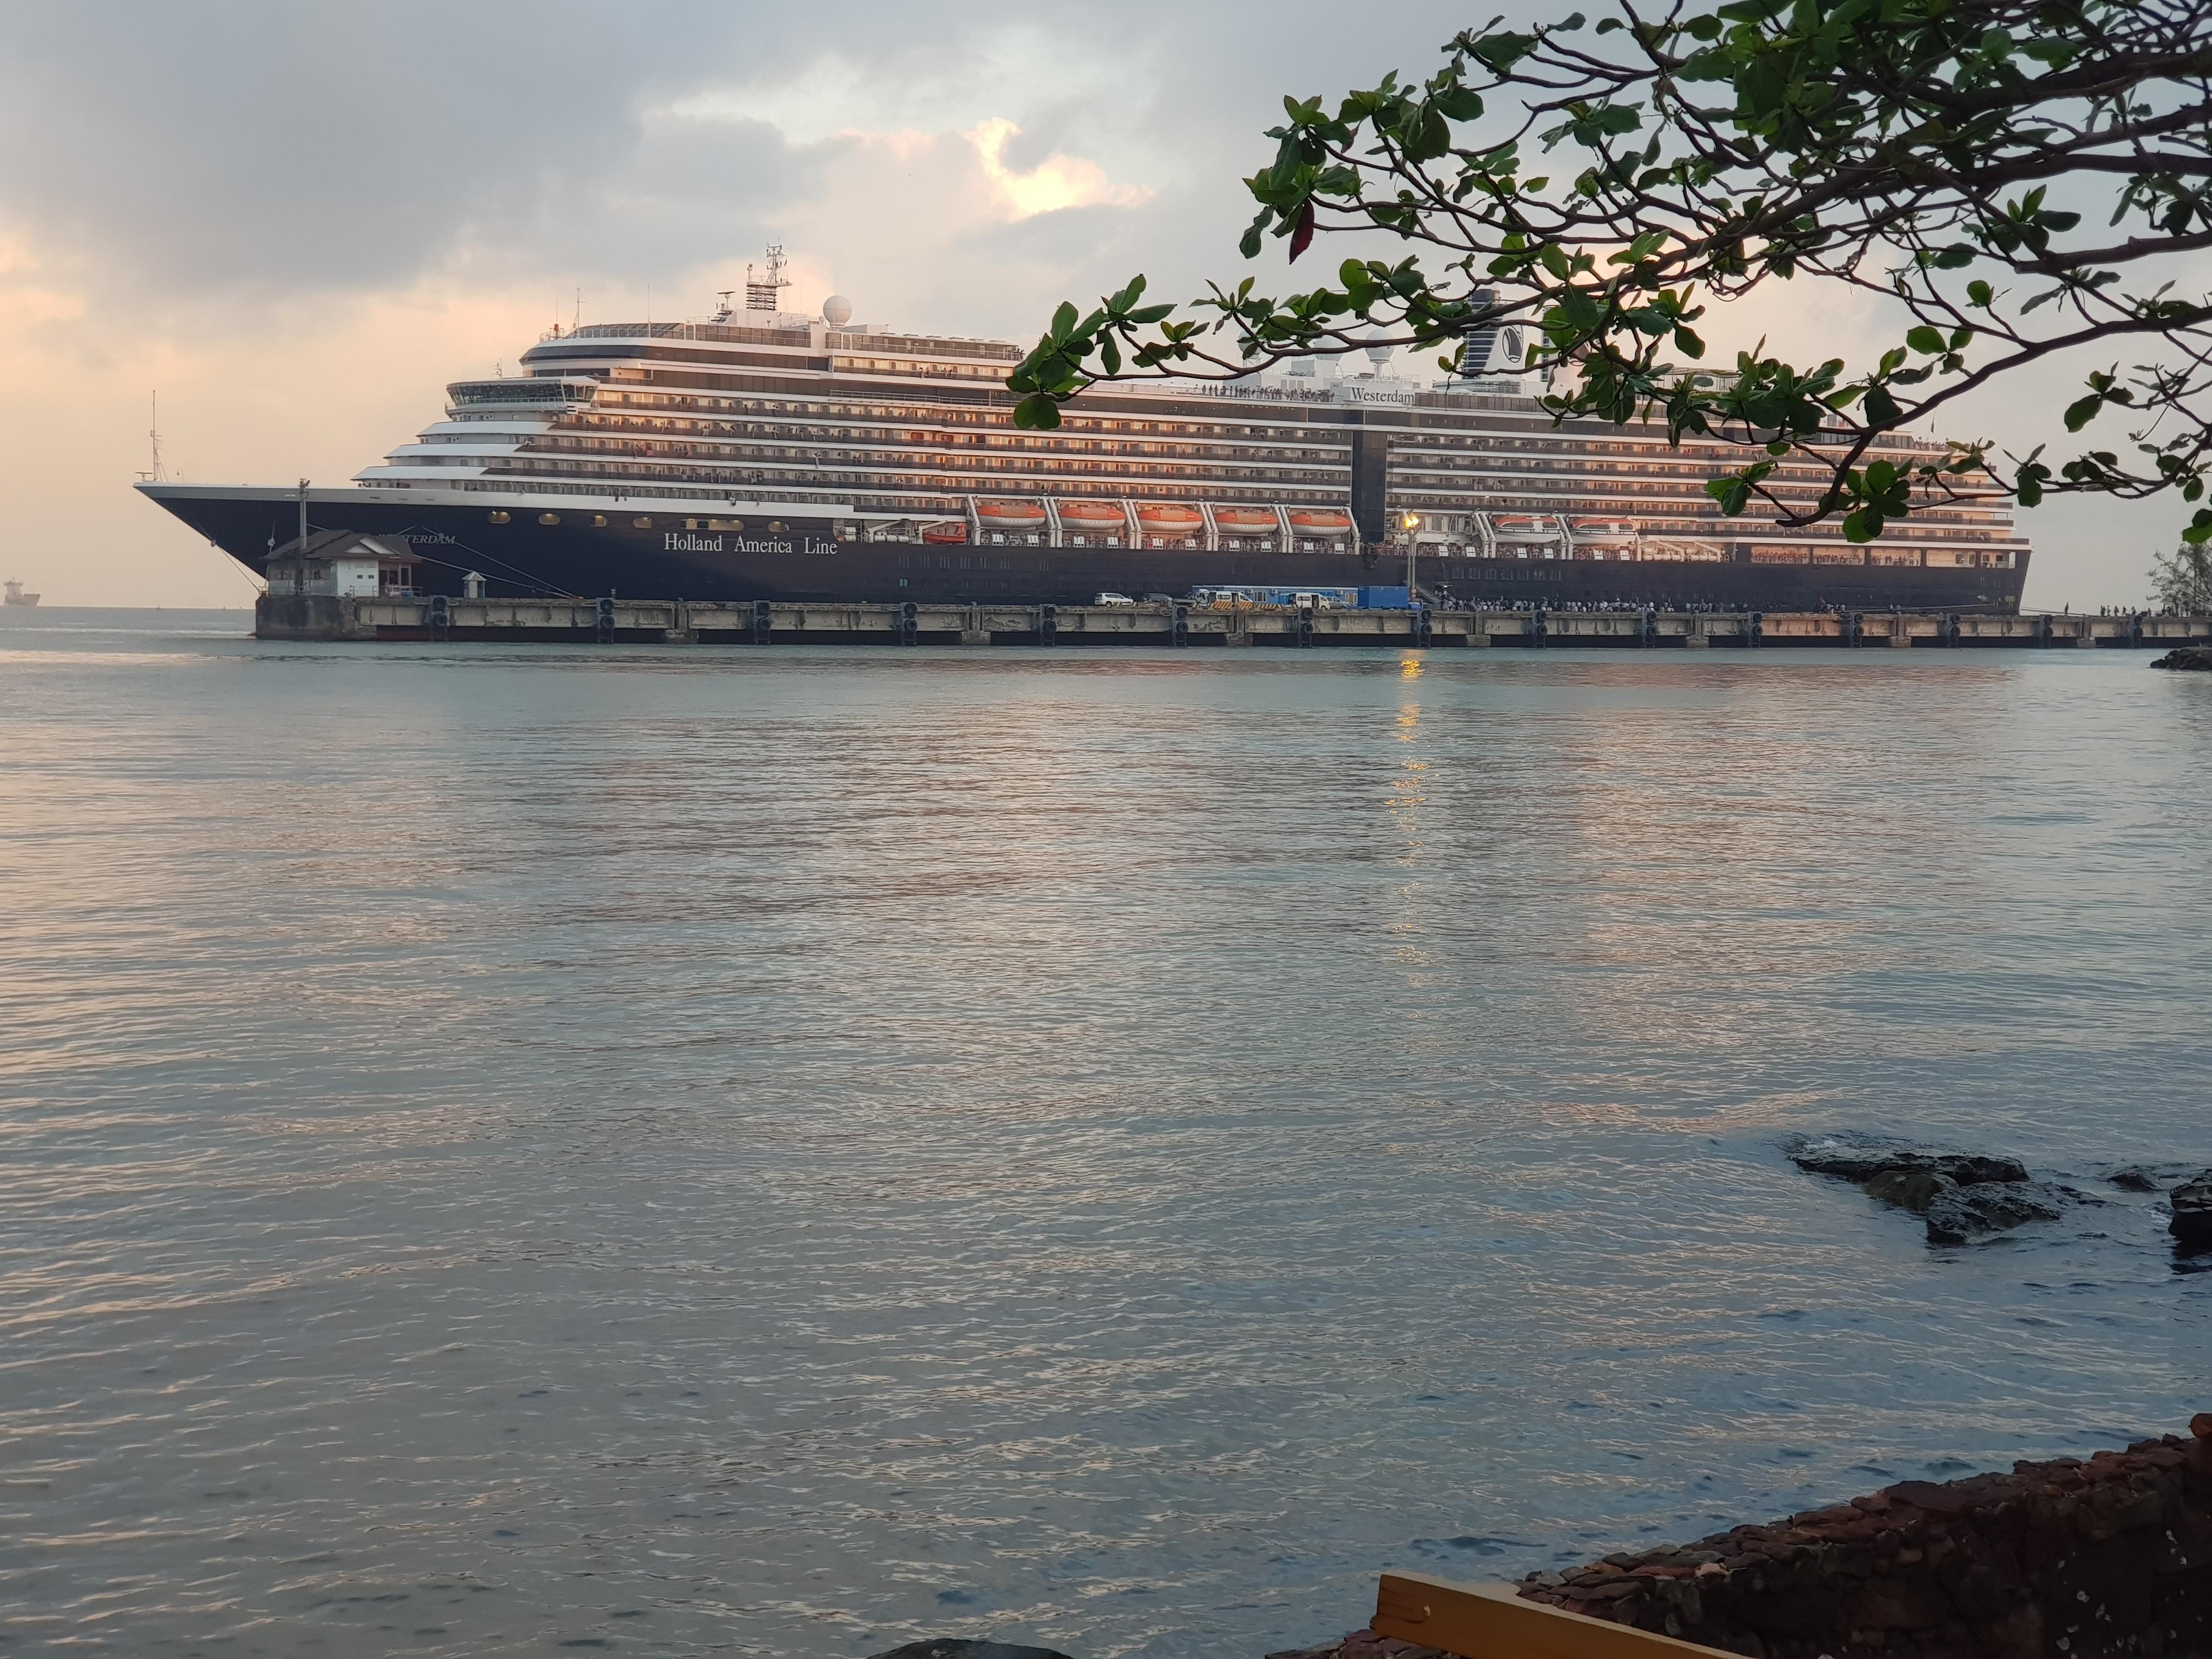 140220-kh-westerdam-cruise-ship